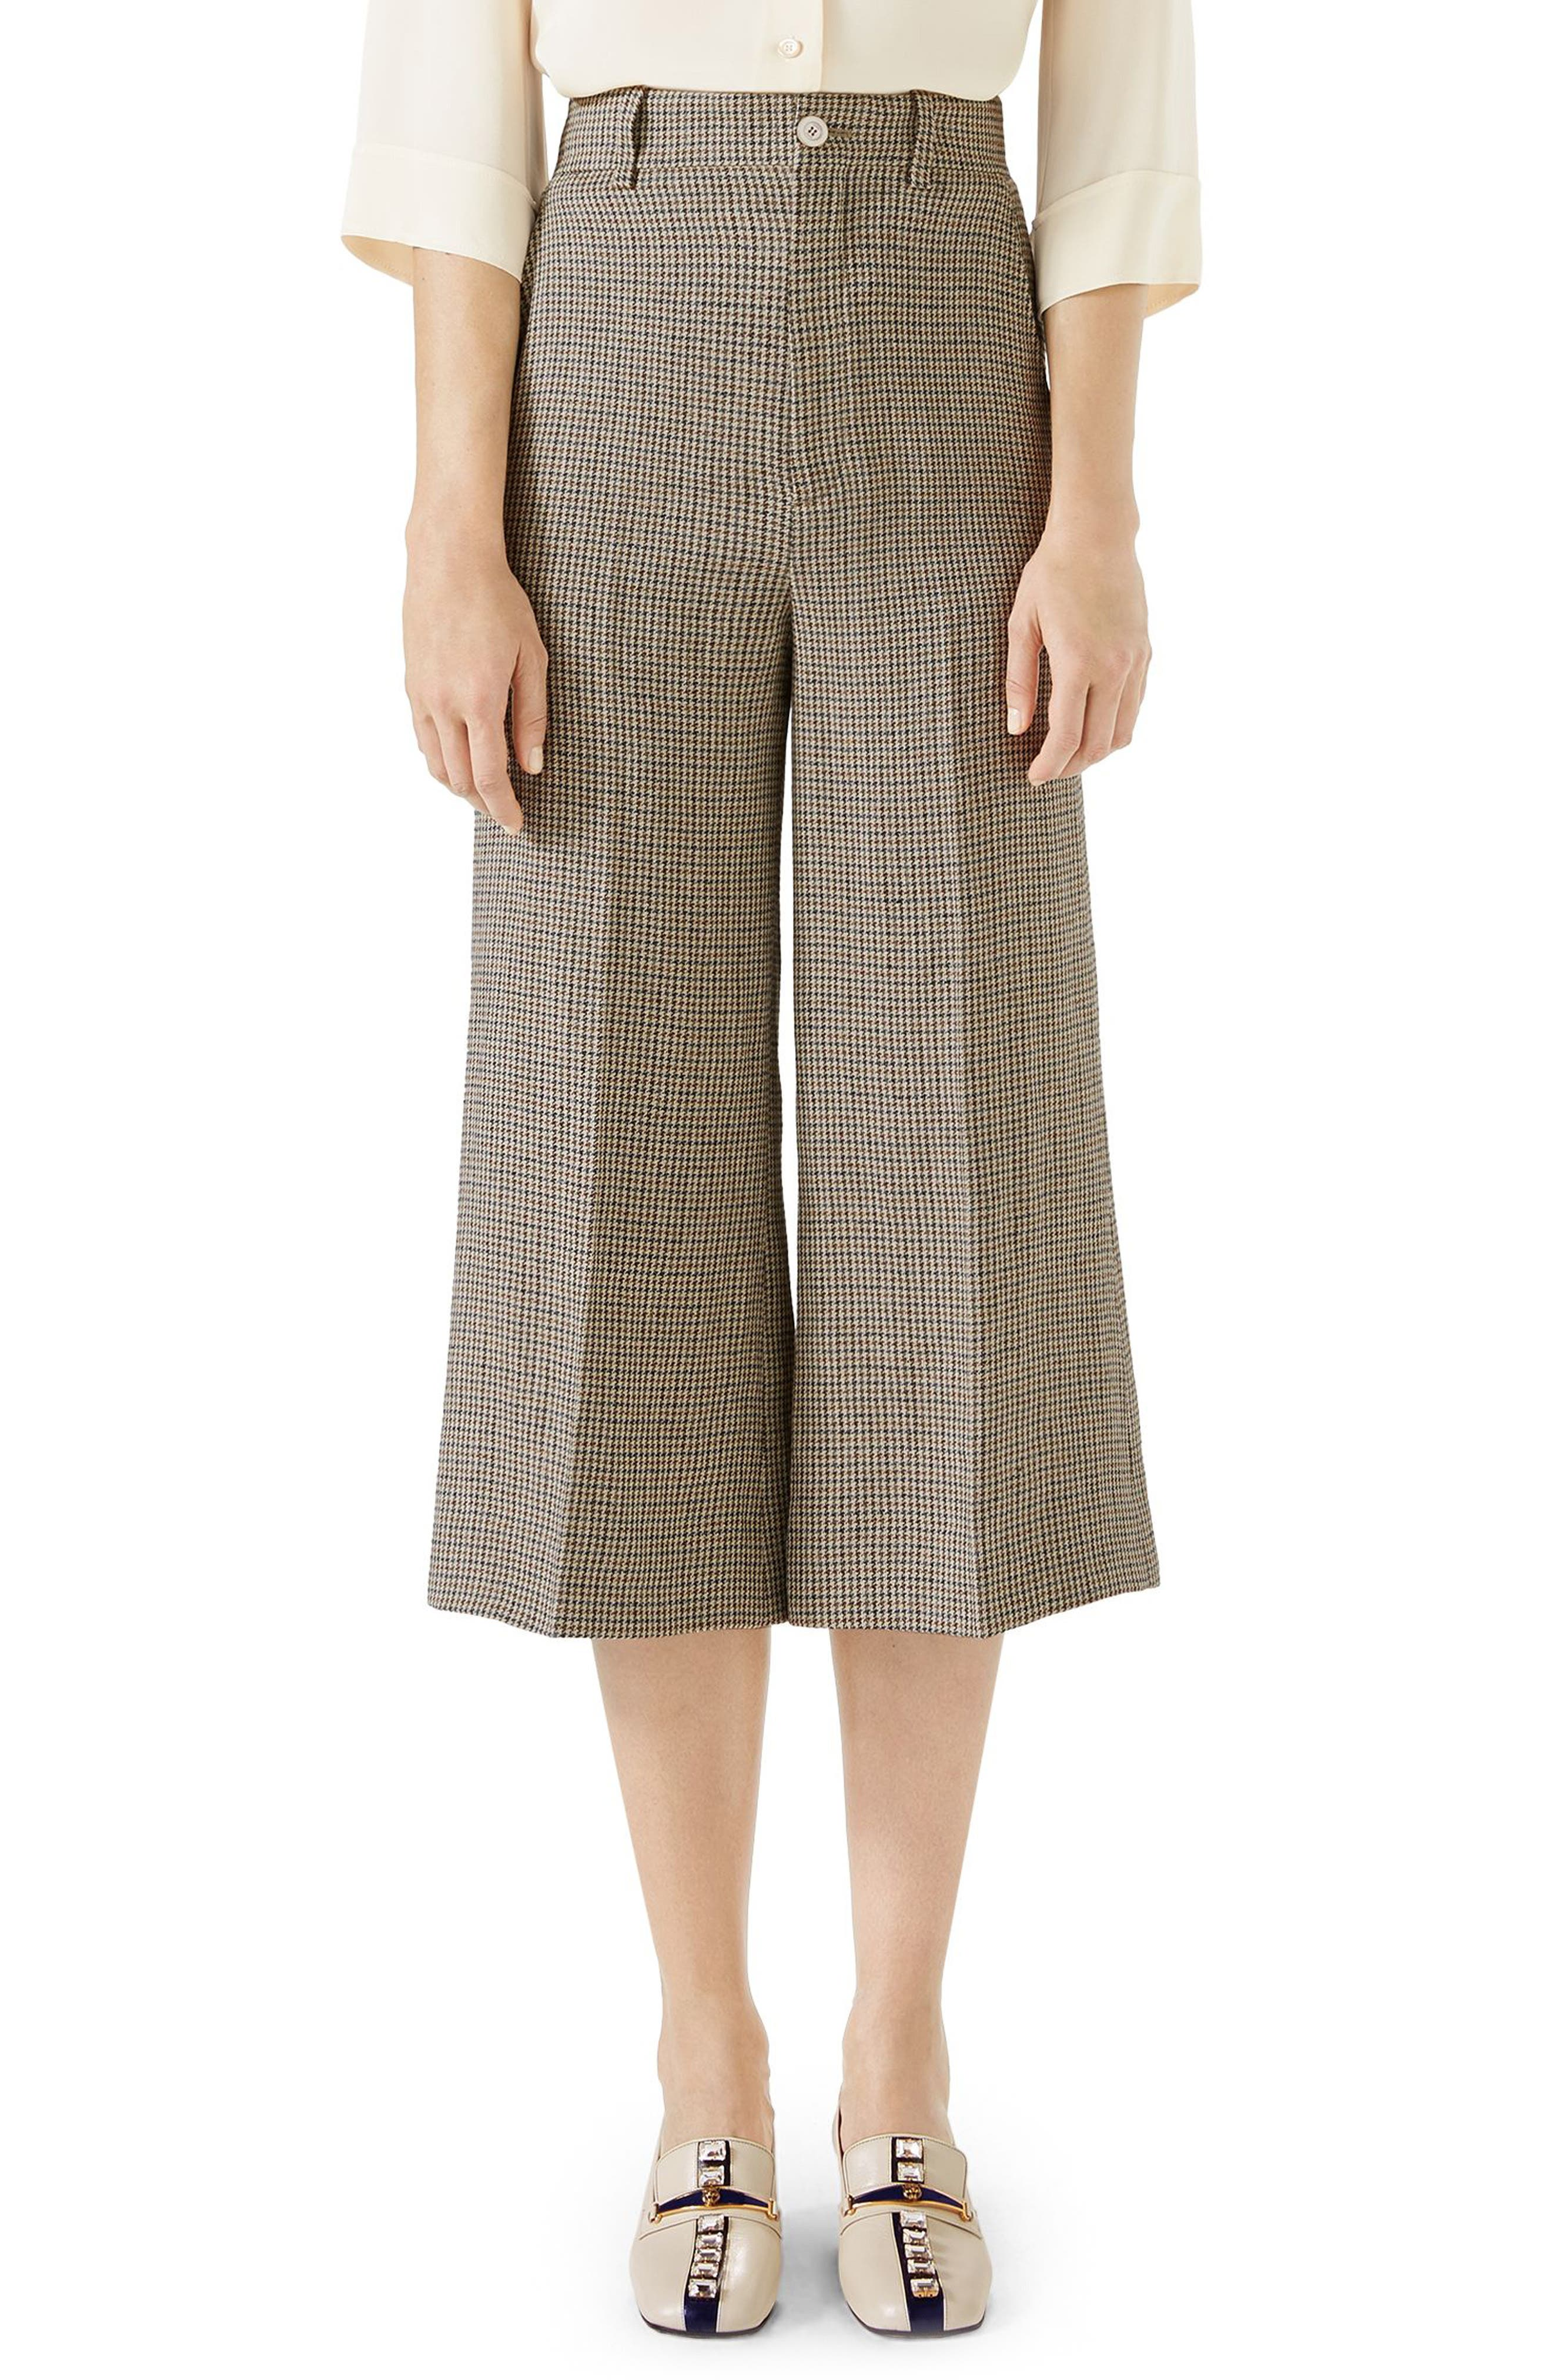 Houndstooth Wide Leg Crop Linen Pants,                             Main thumbnail 1, color,                             BEIGE/ BRUN DEGARANCE